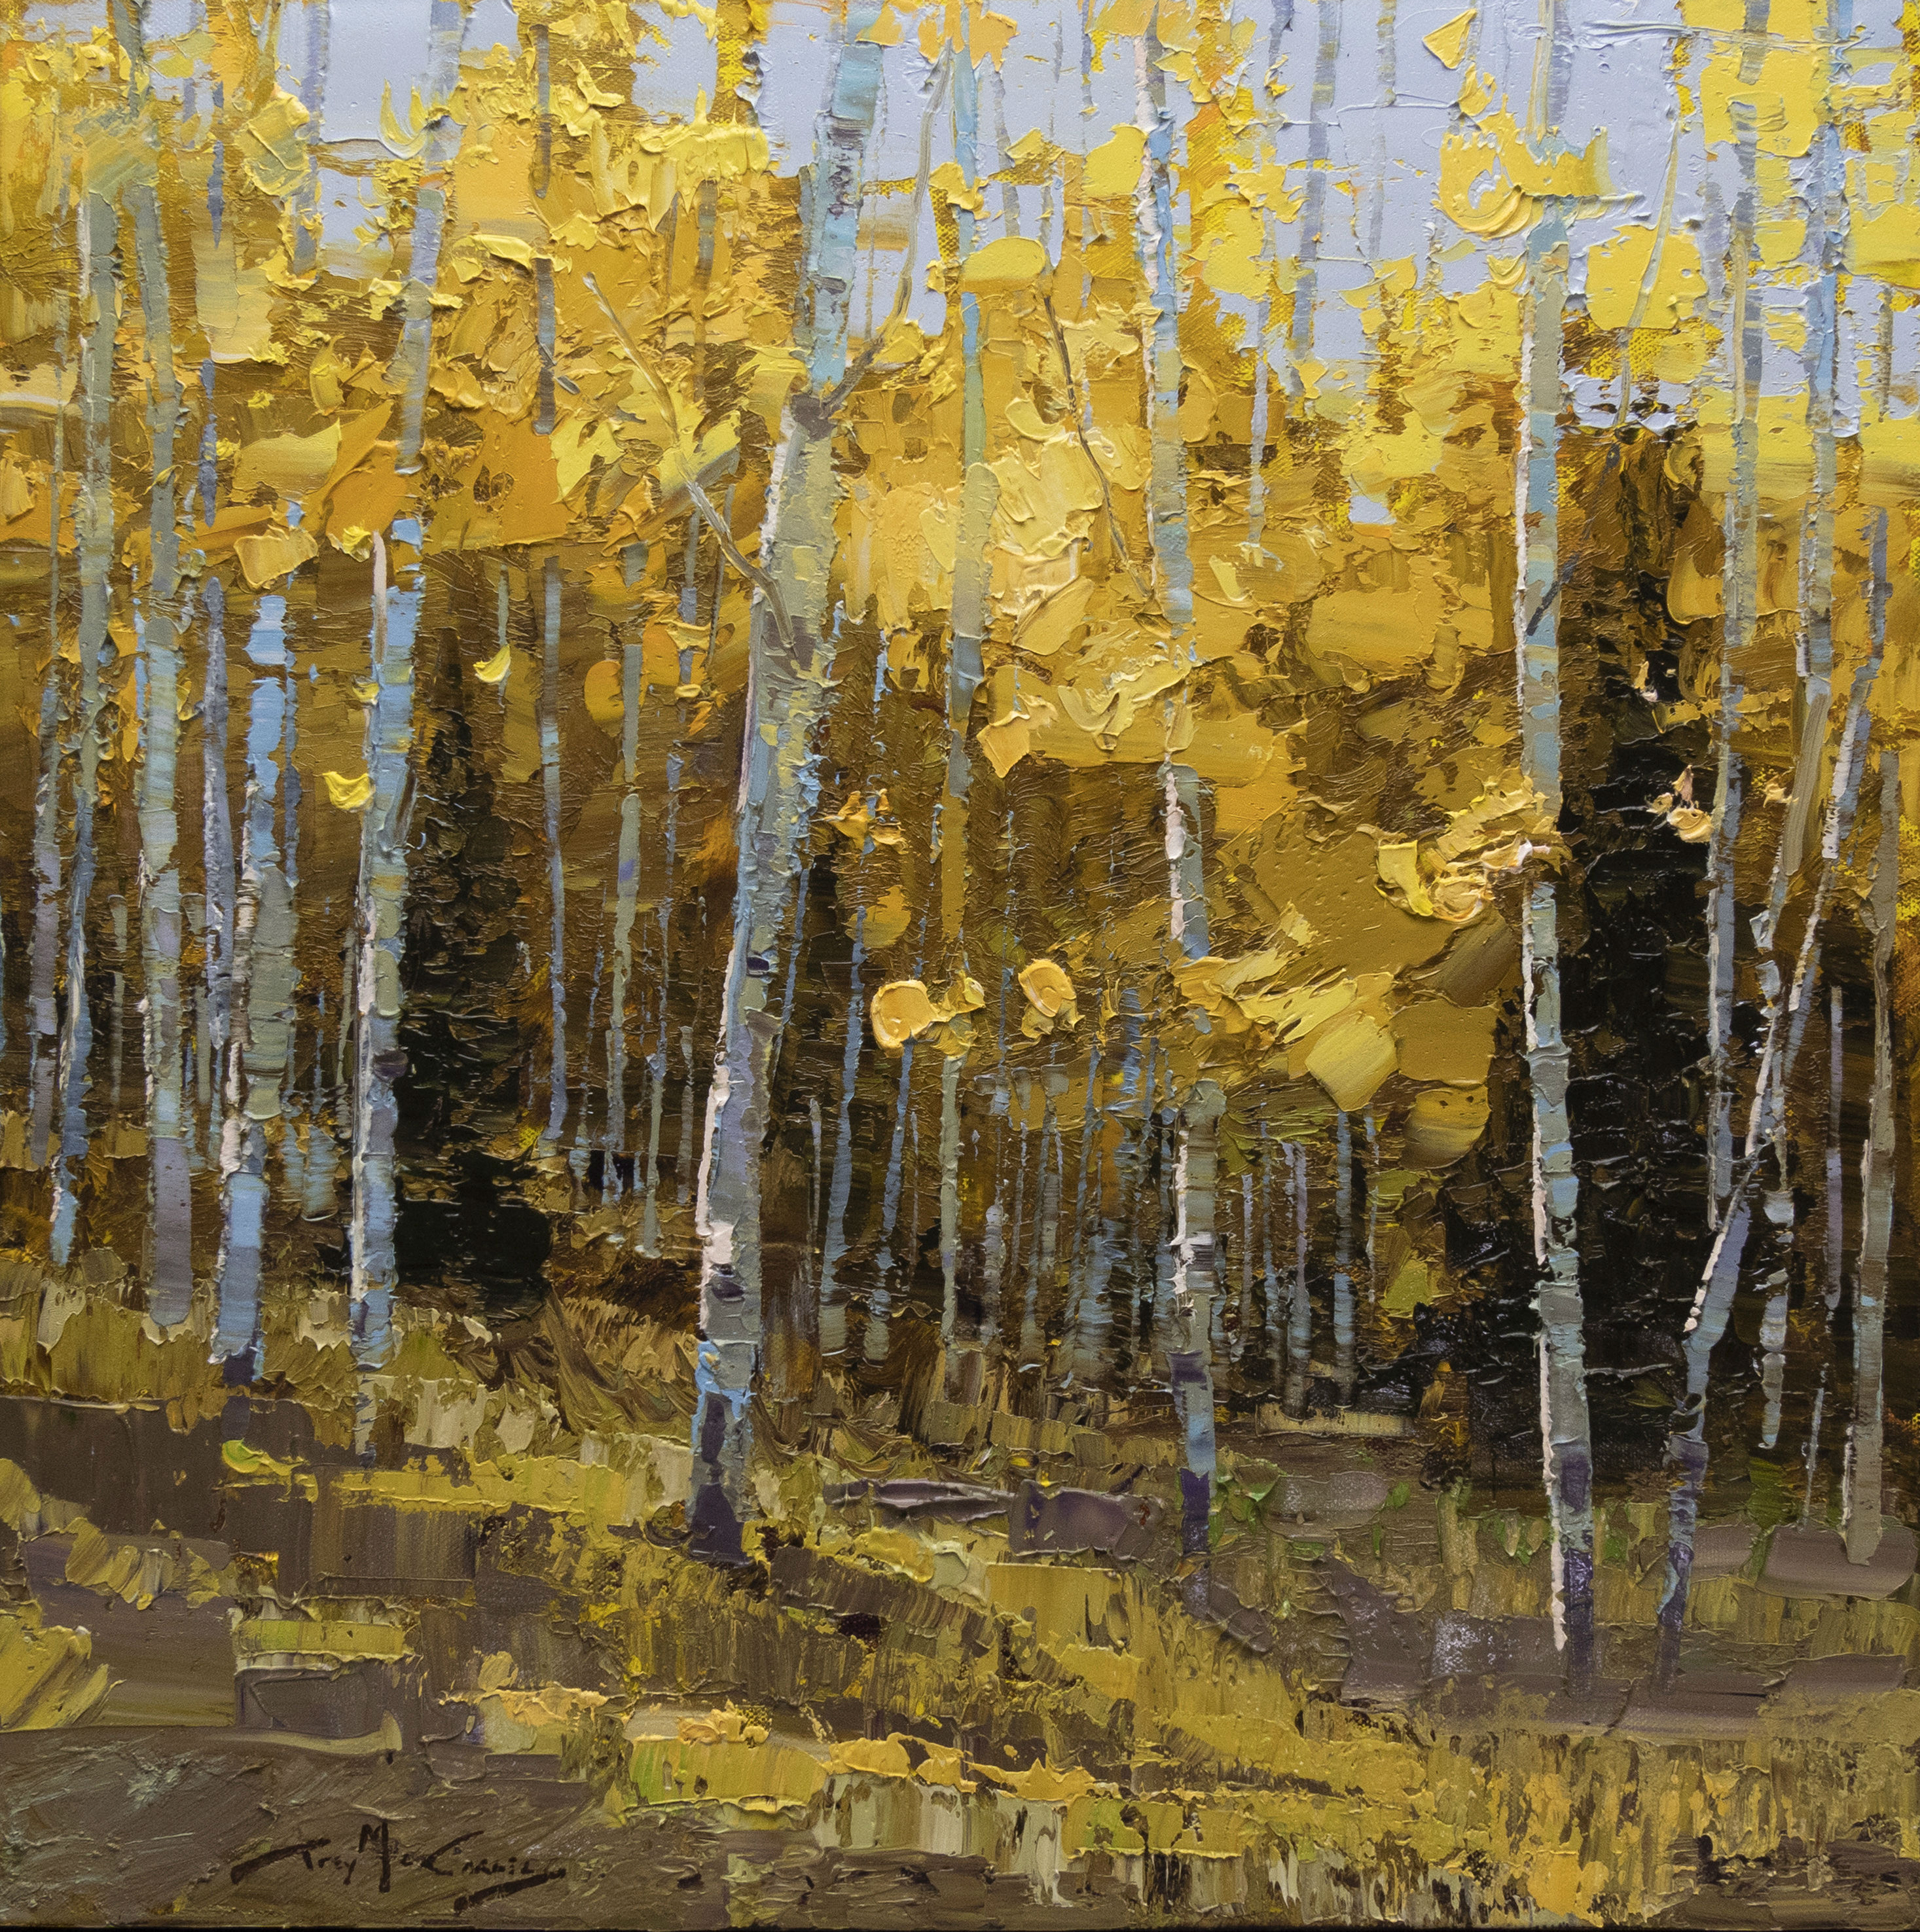 Golden Hour by Trey McCarley